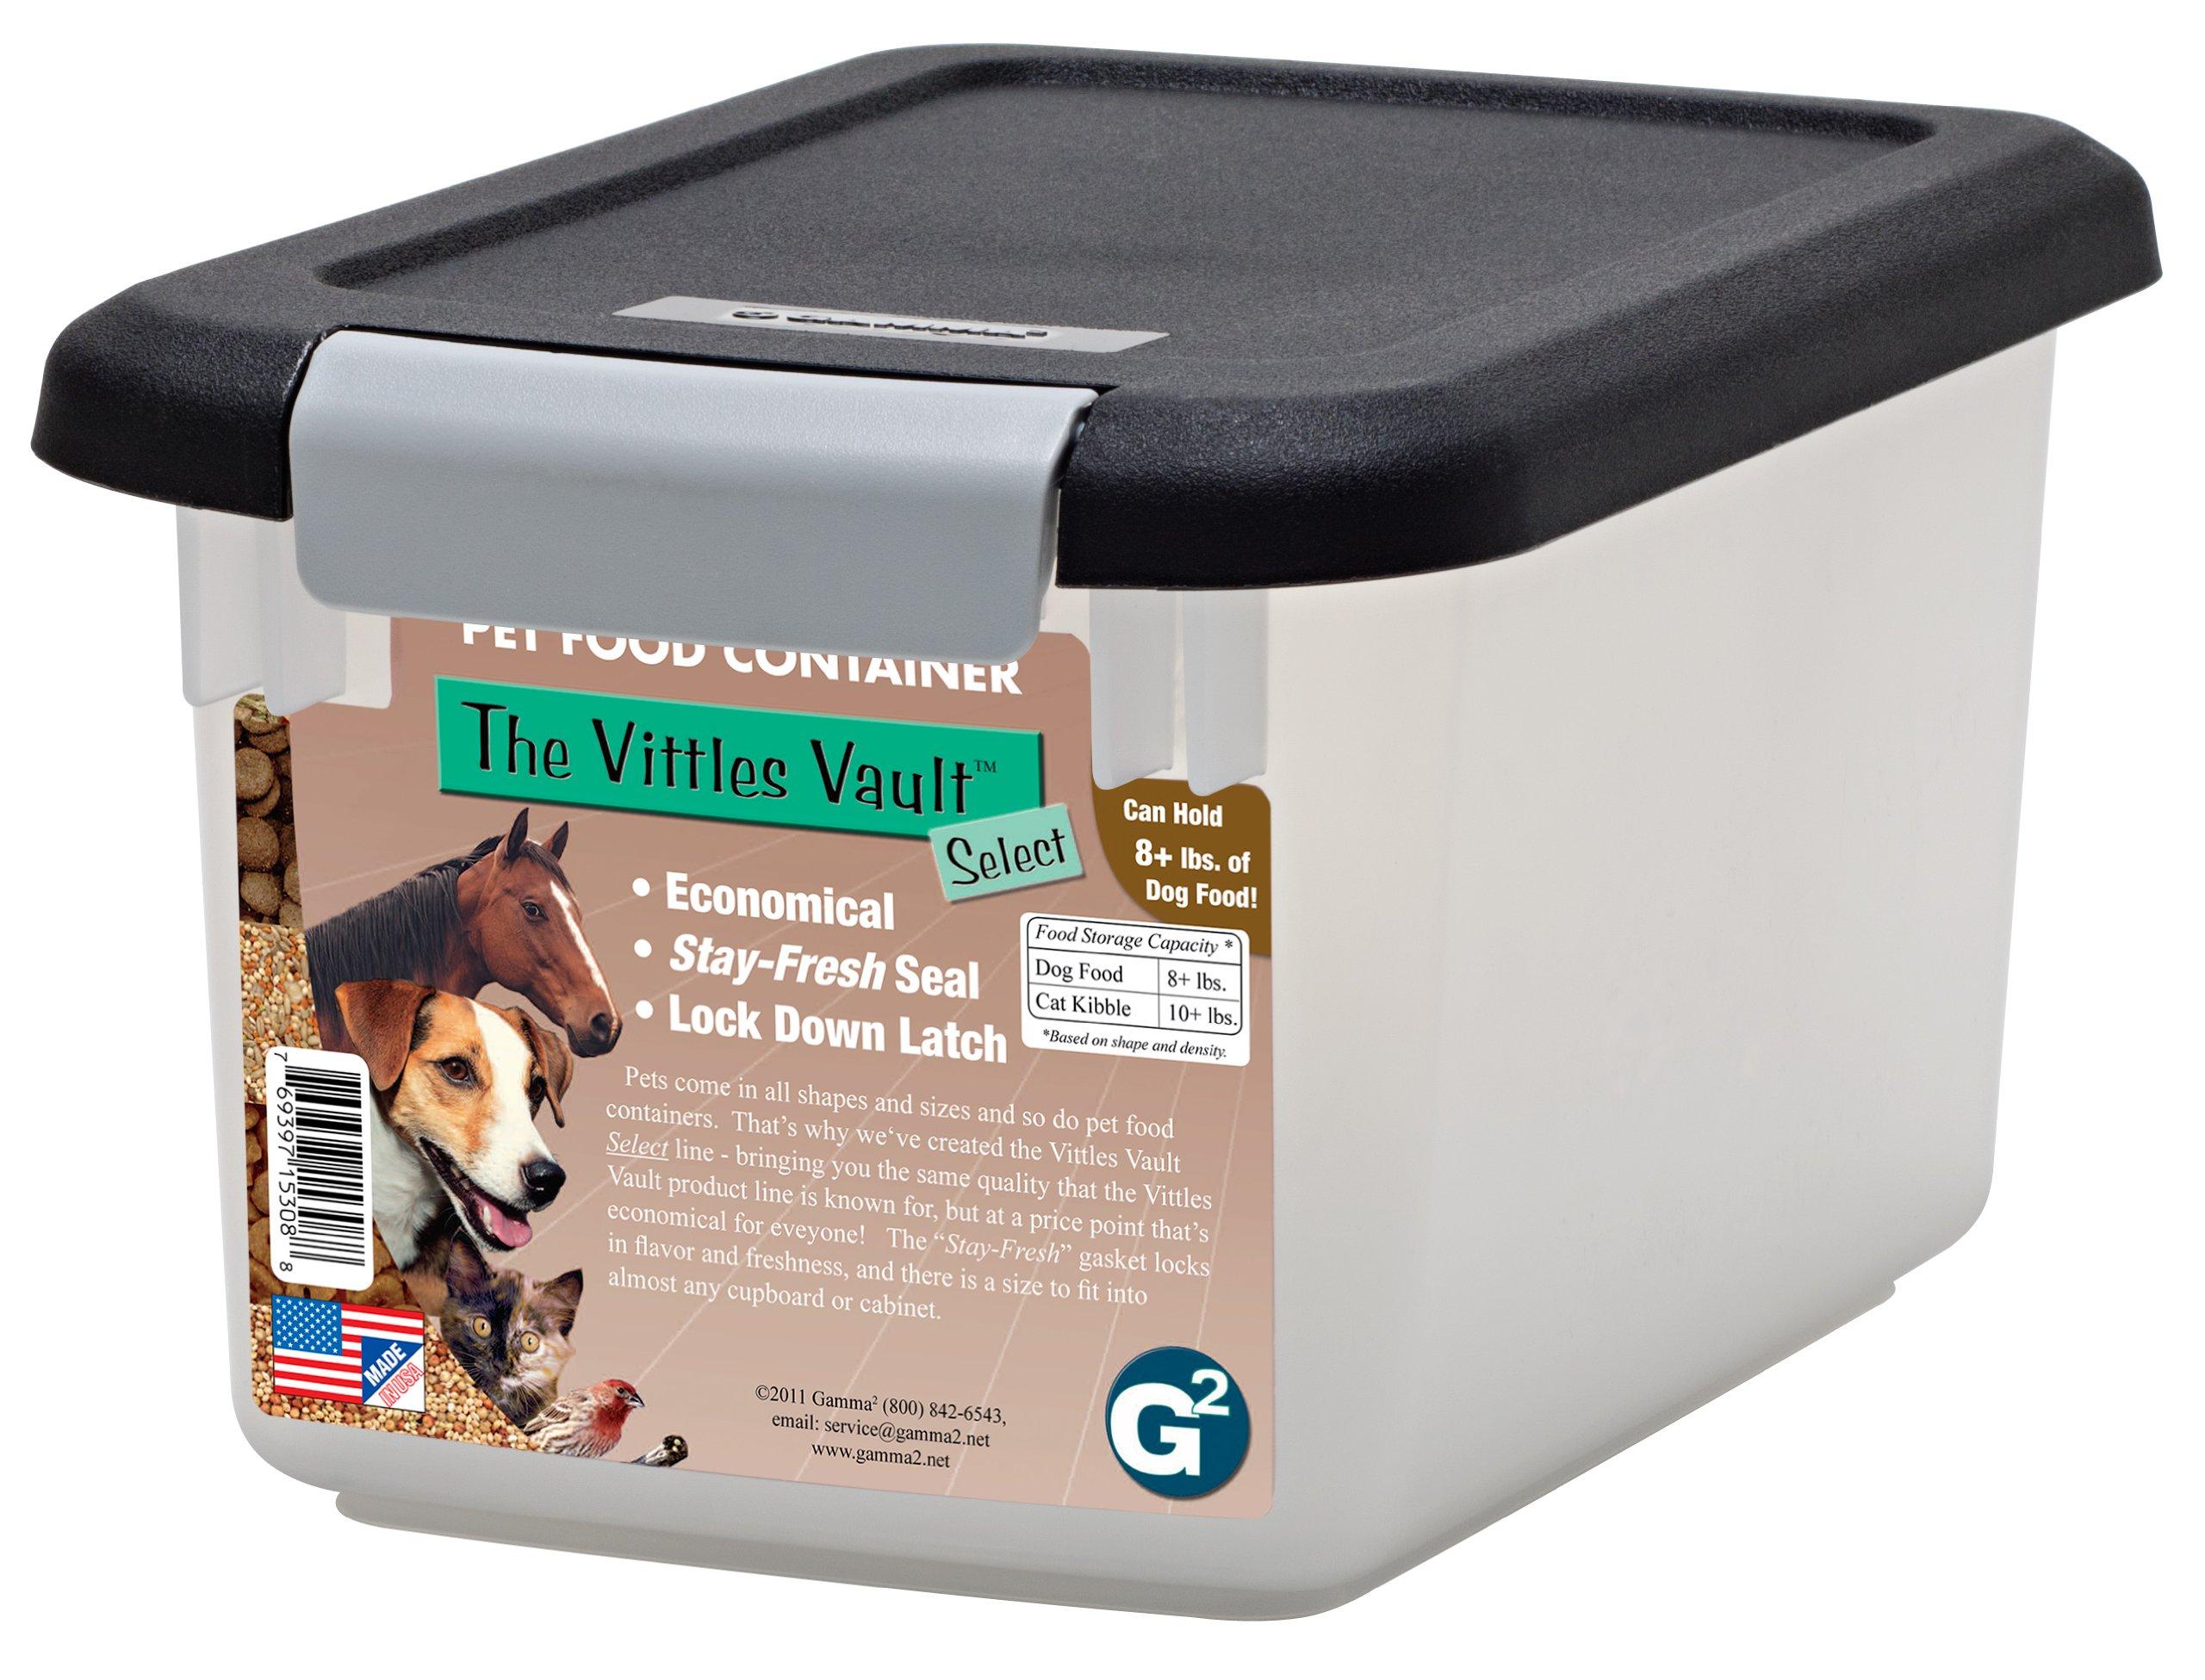 GAMMA2 Vittles Vault Airtight Pet Food Container 8lb